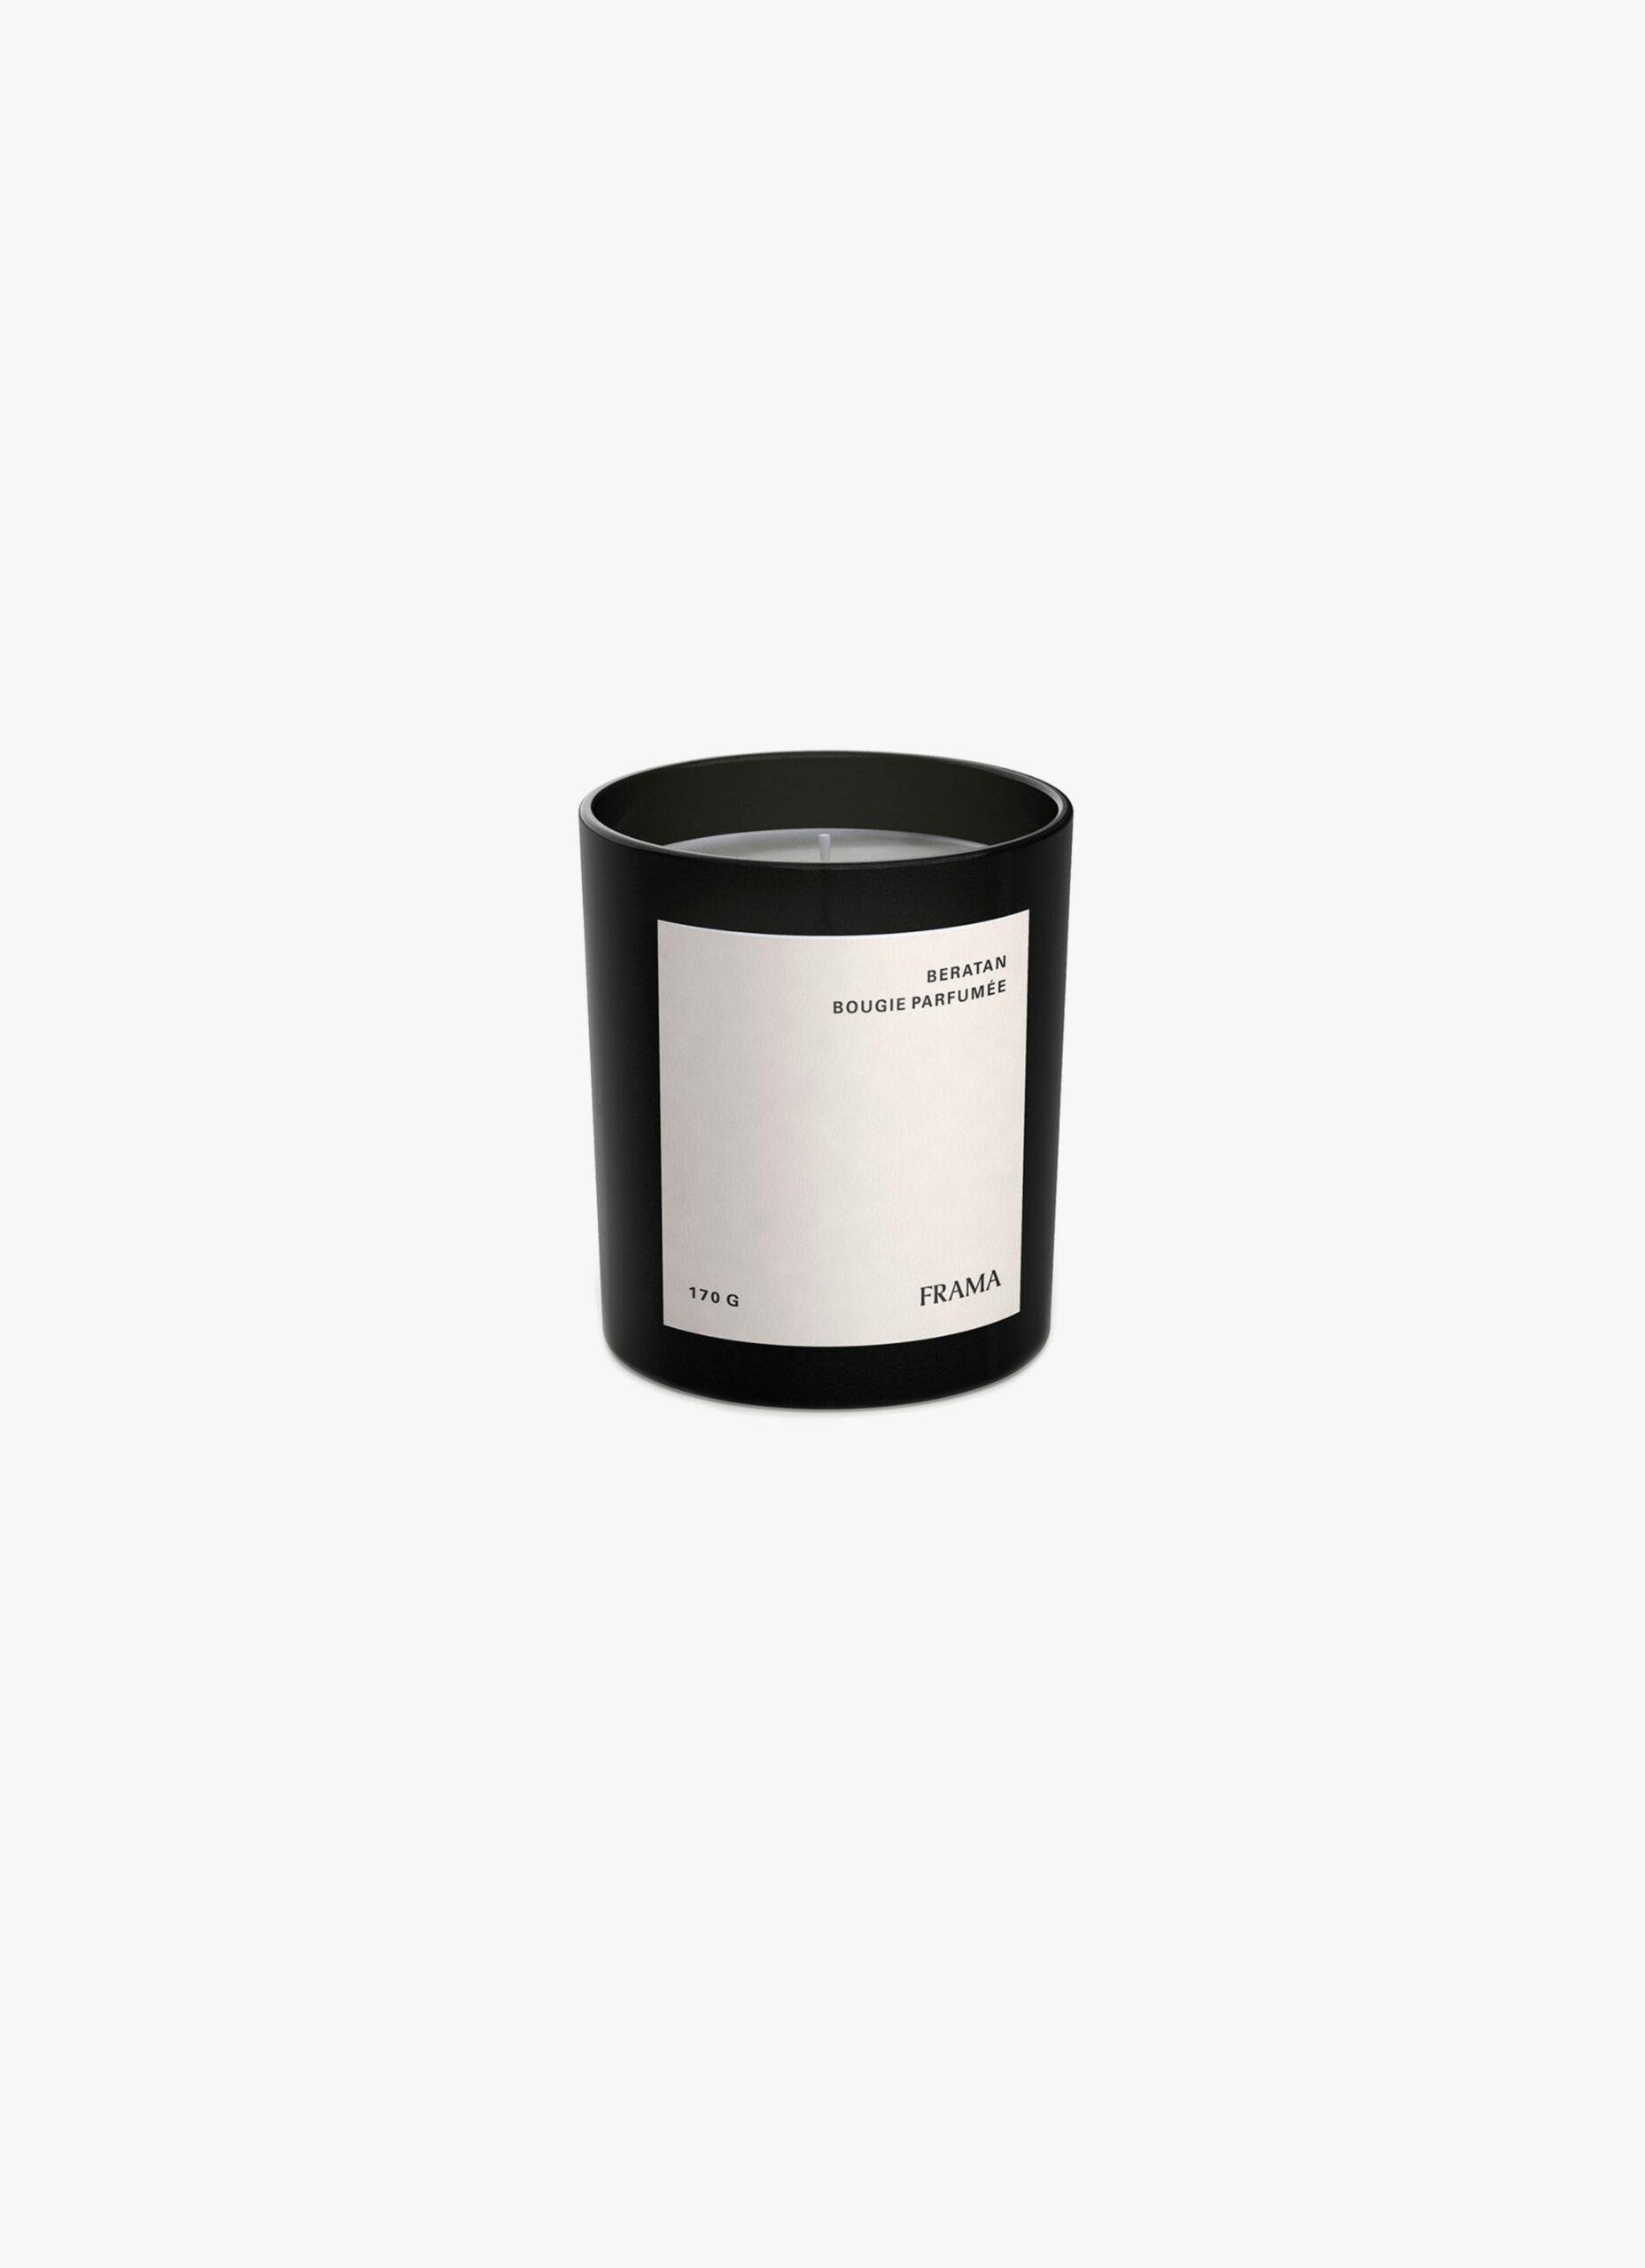 Frama - Scented Candle - Beratan - 170 g